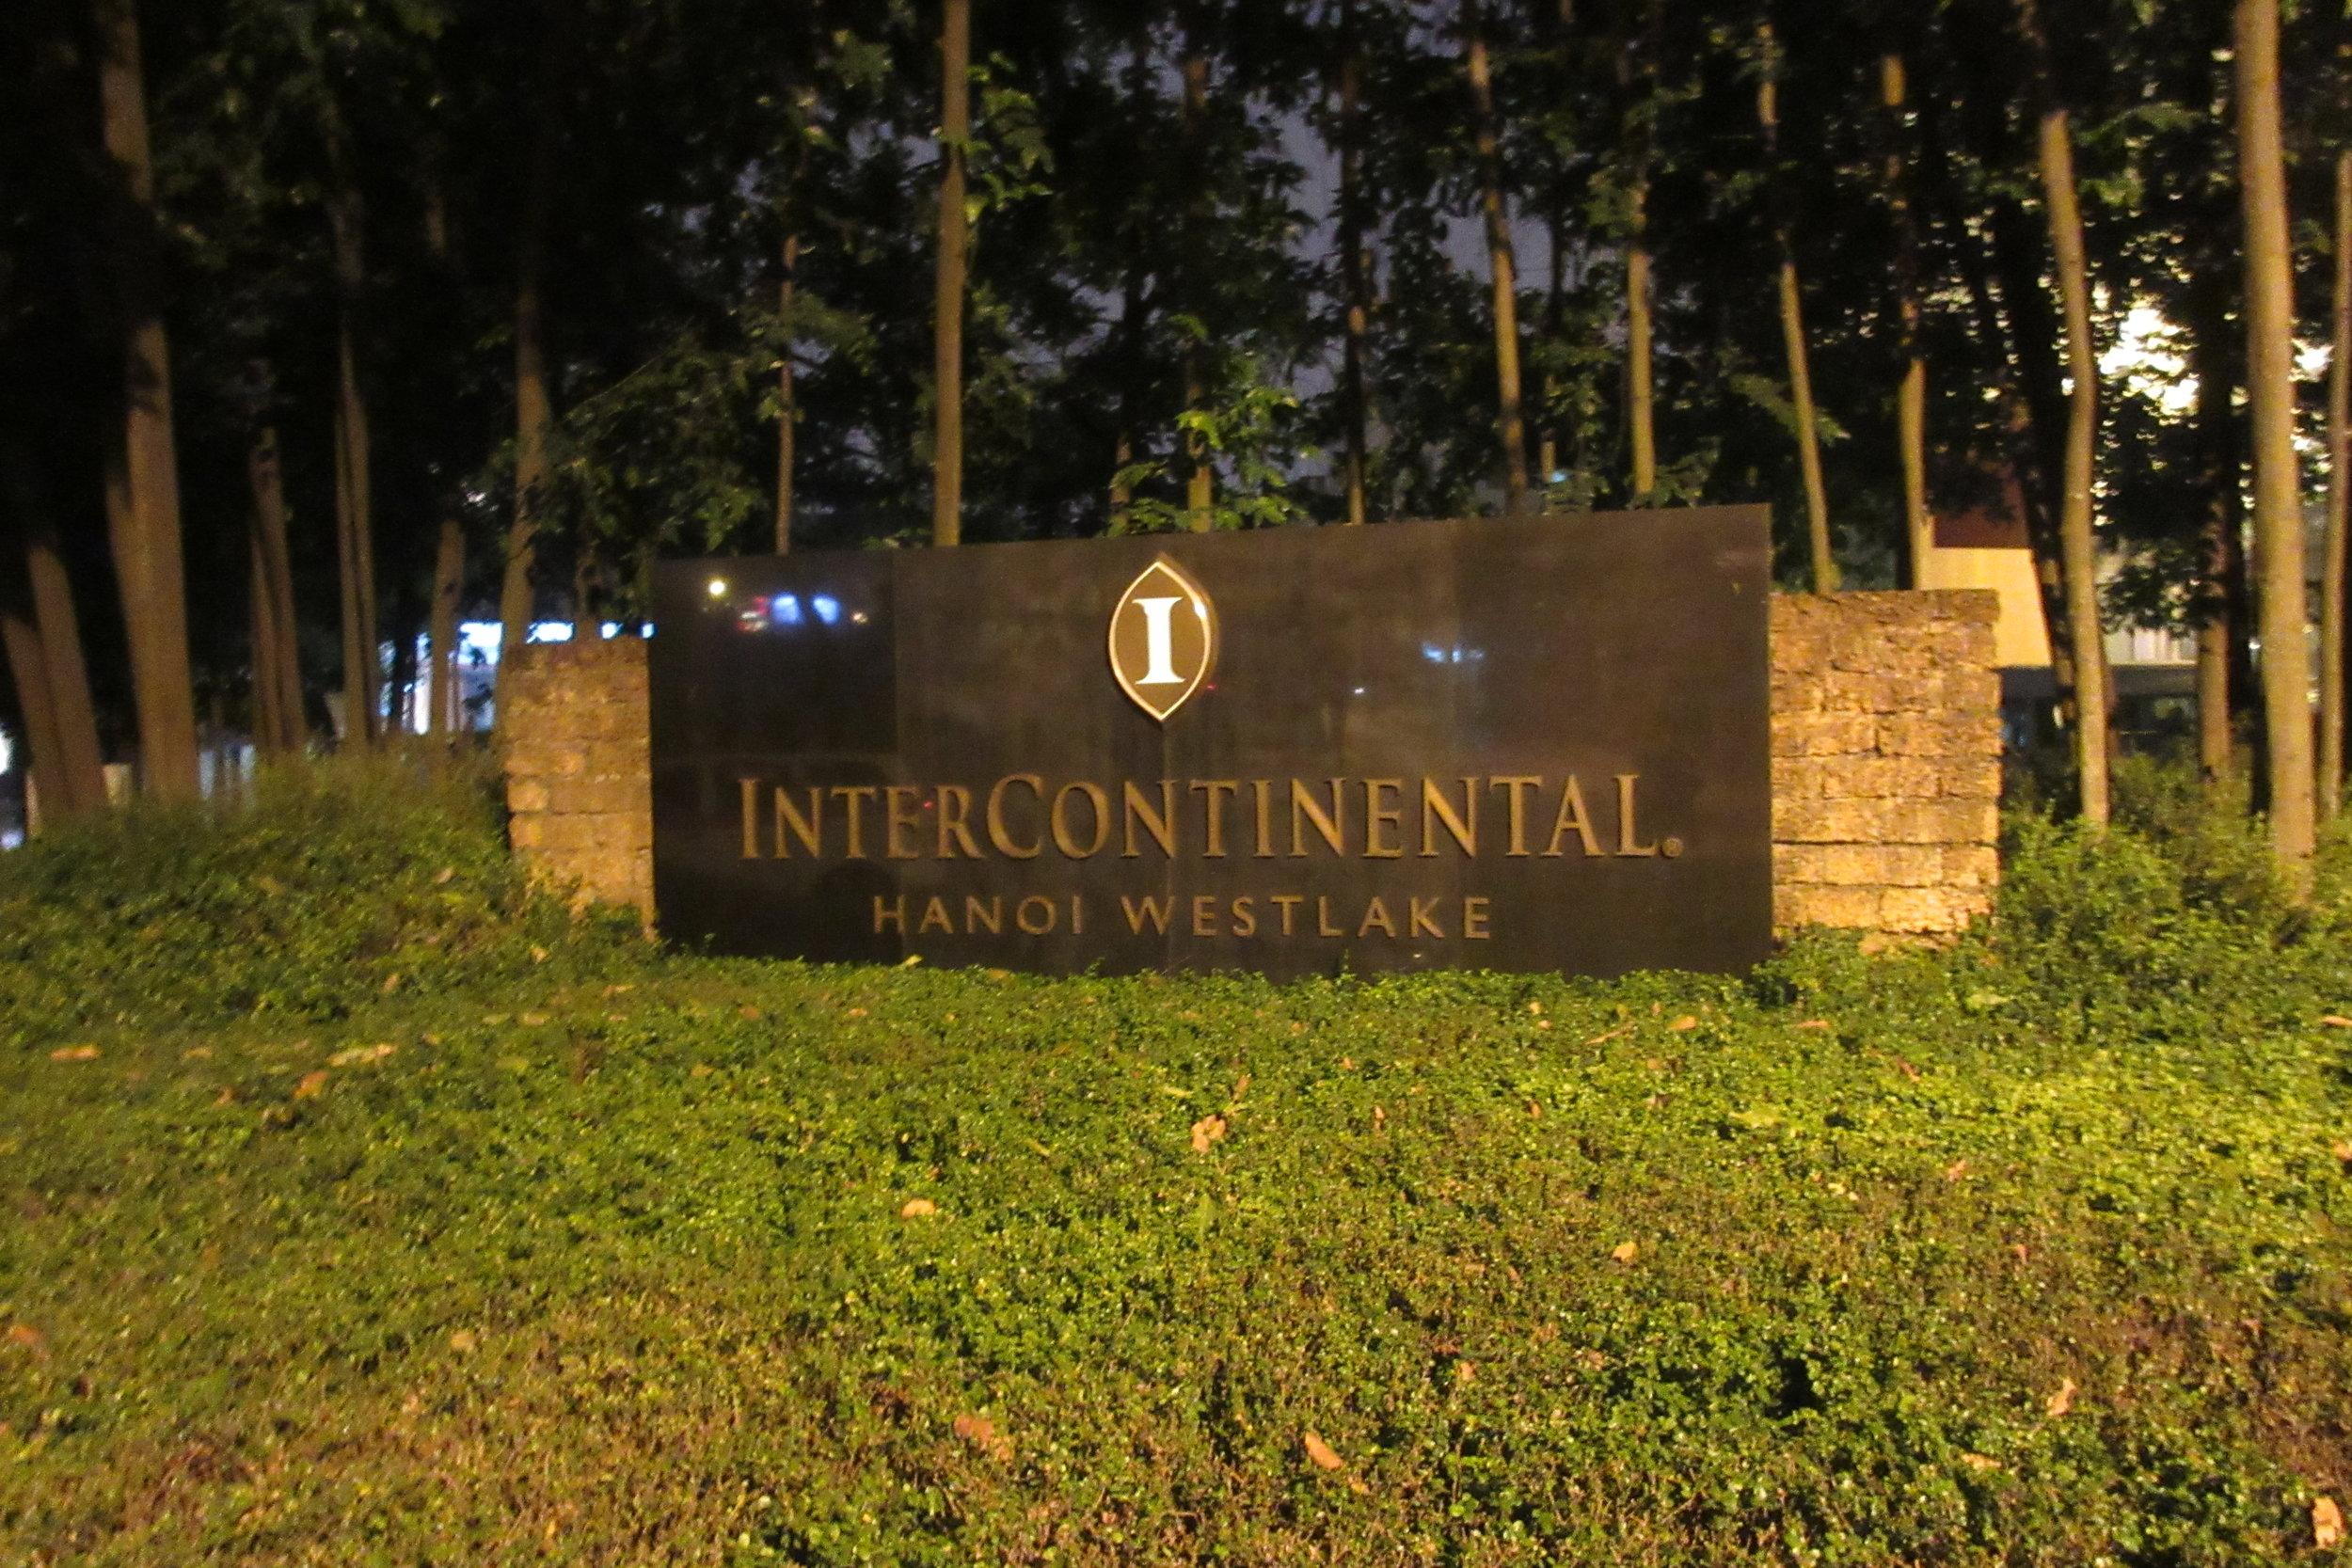 InterContinental Hanoi Westlake – Entrance sign